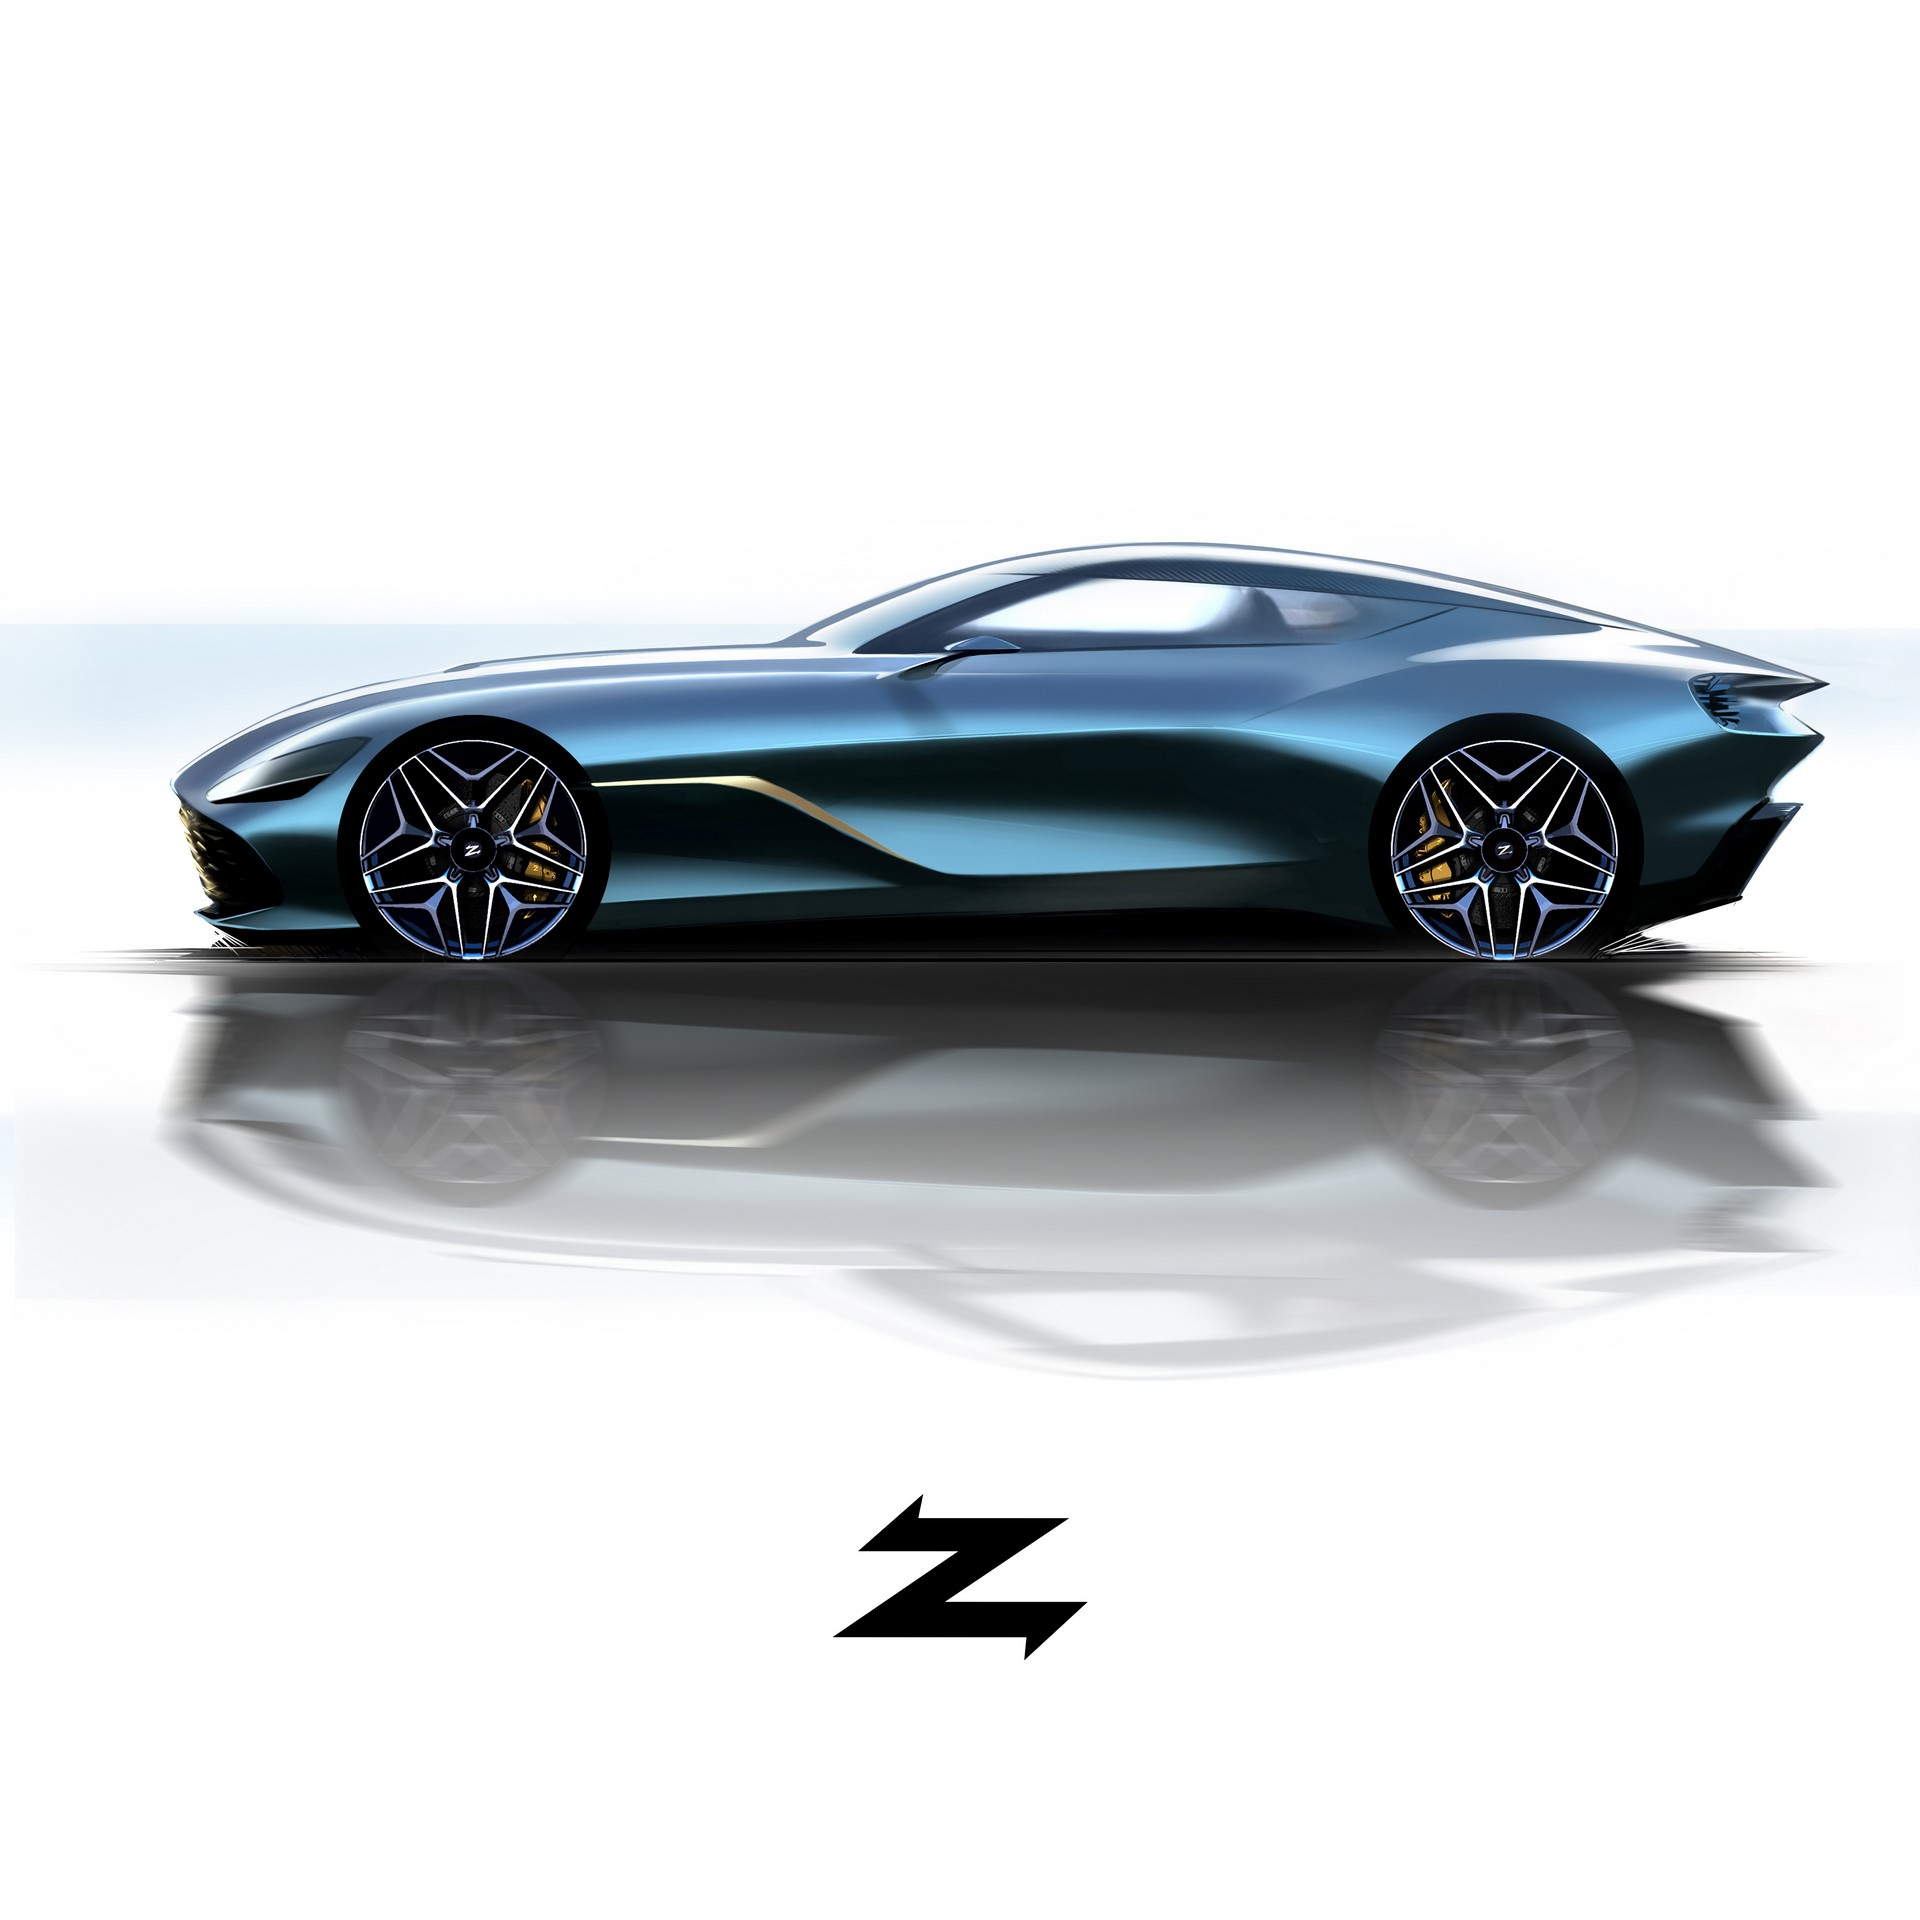 DBS GT Zagato_03